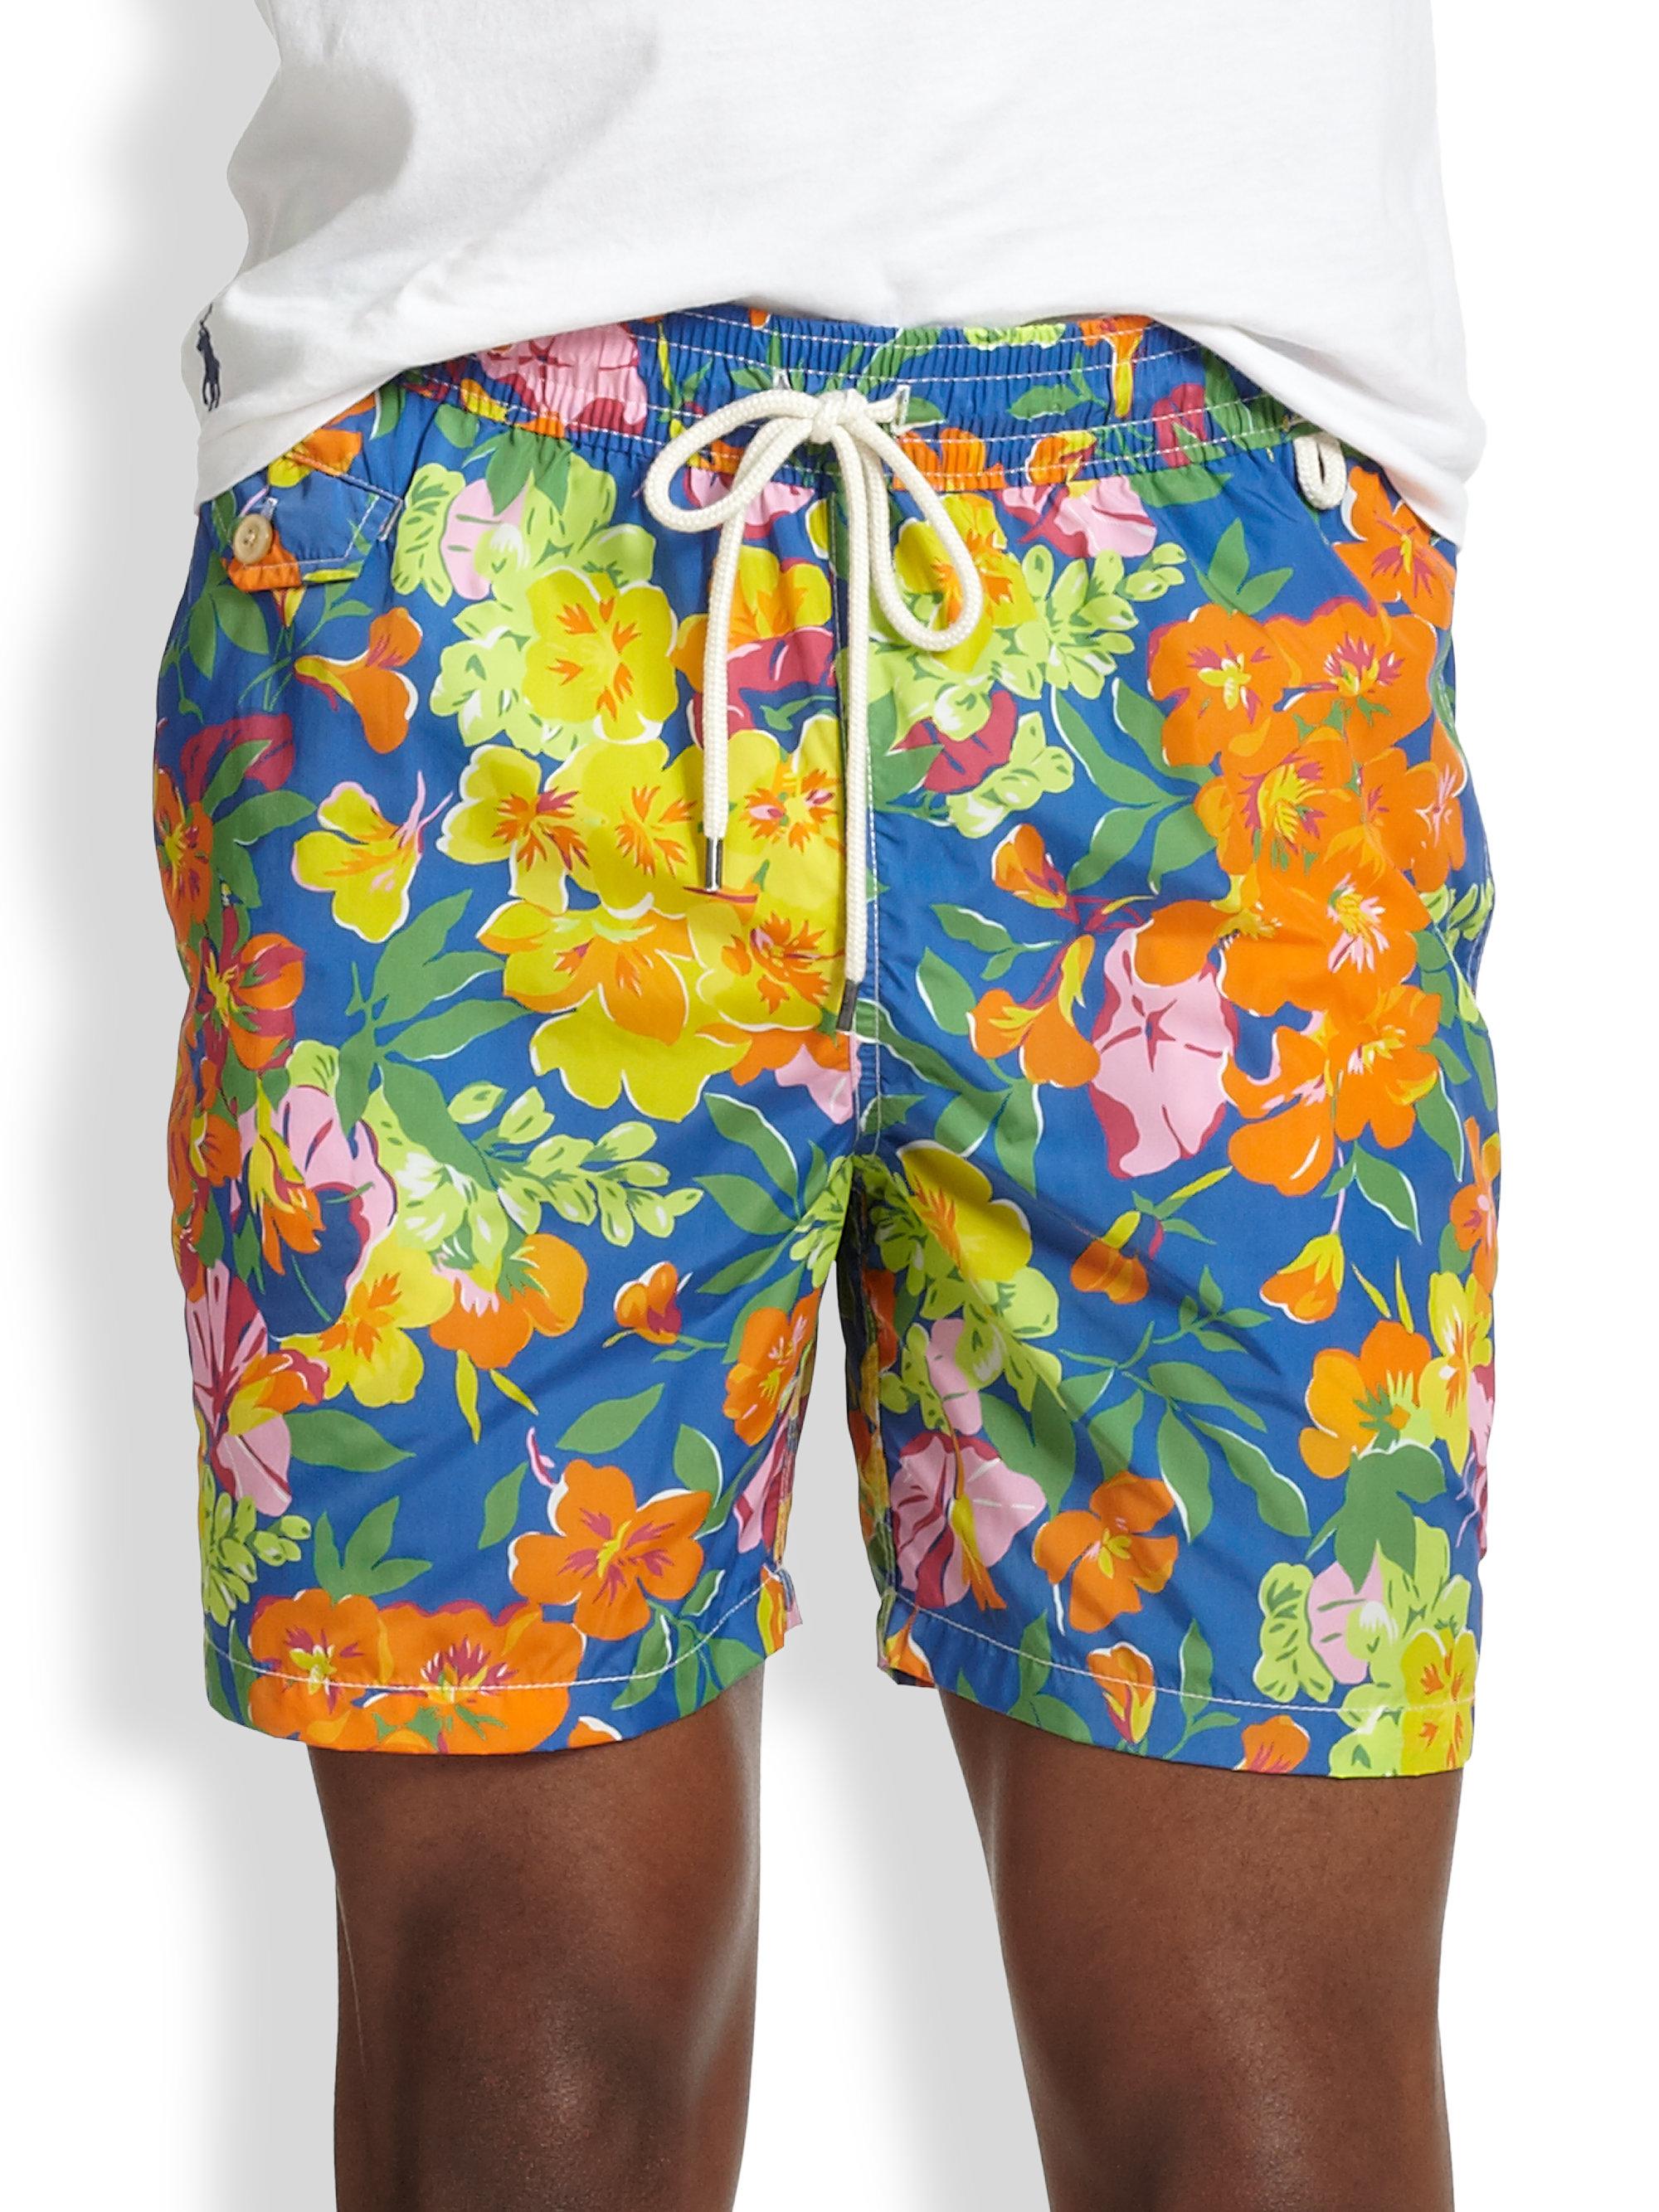 627fe725f8587 Polo Ralph Lauren Island Floralprint Swim Trunks in Blue for Men - Lyst